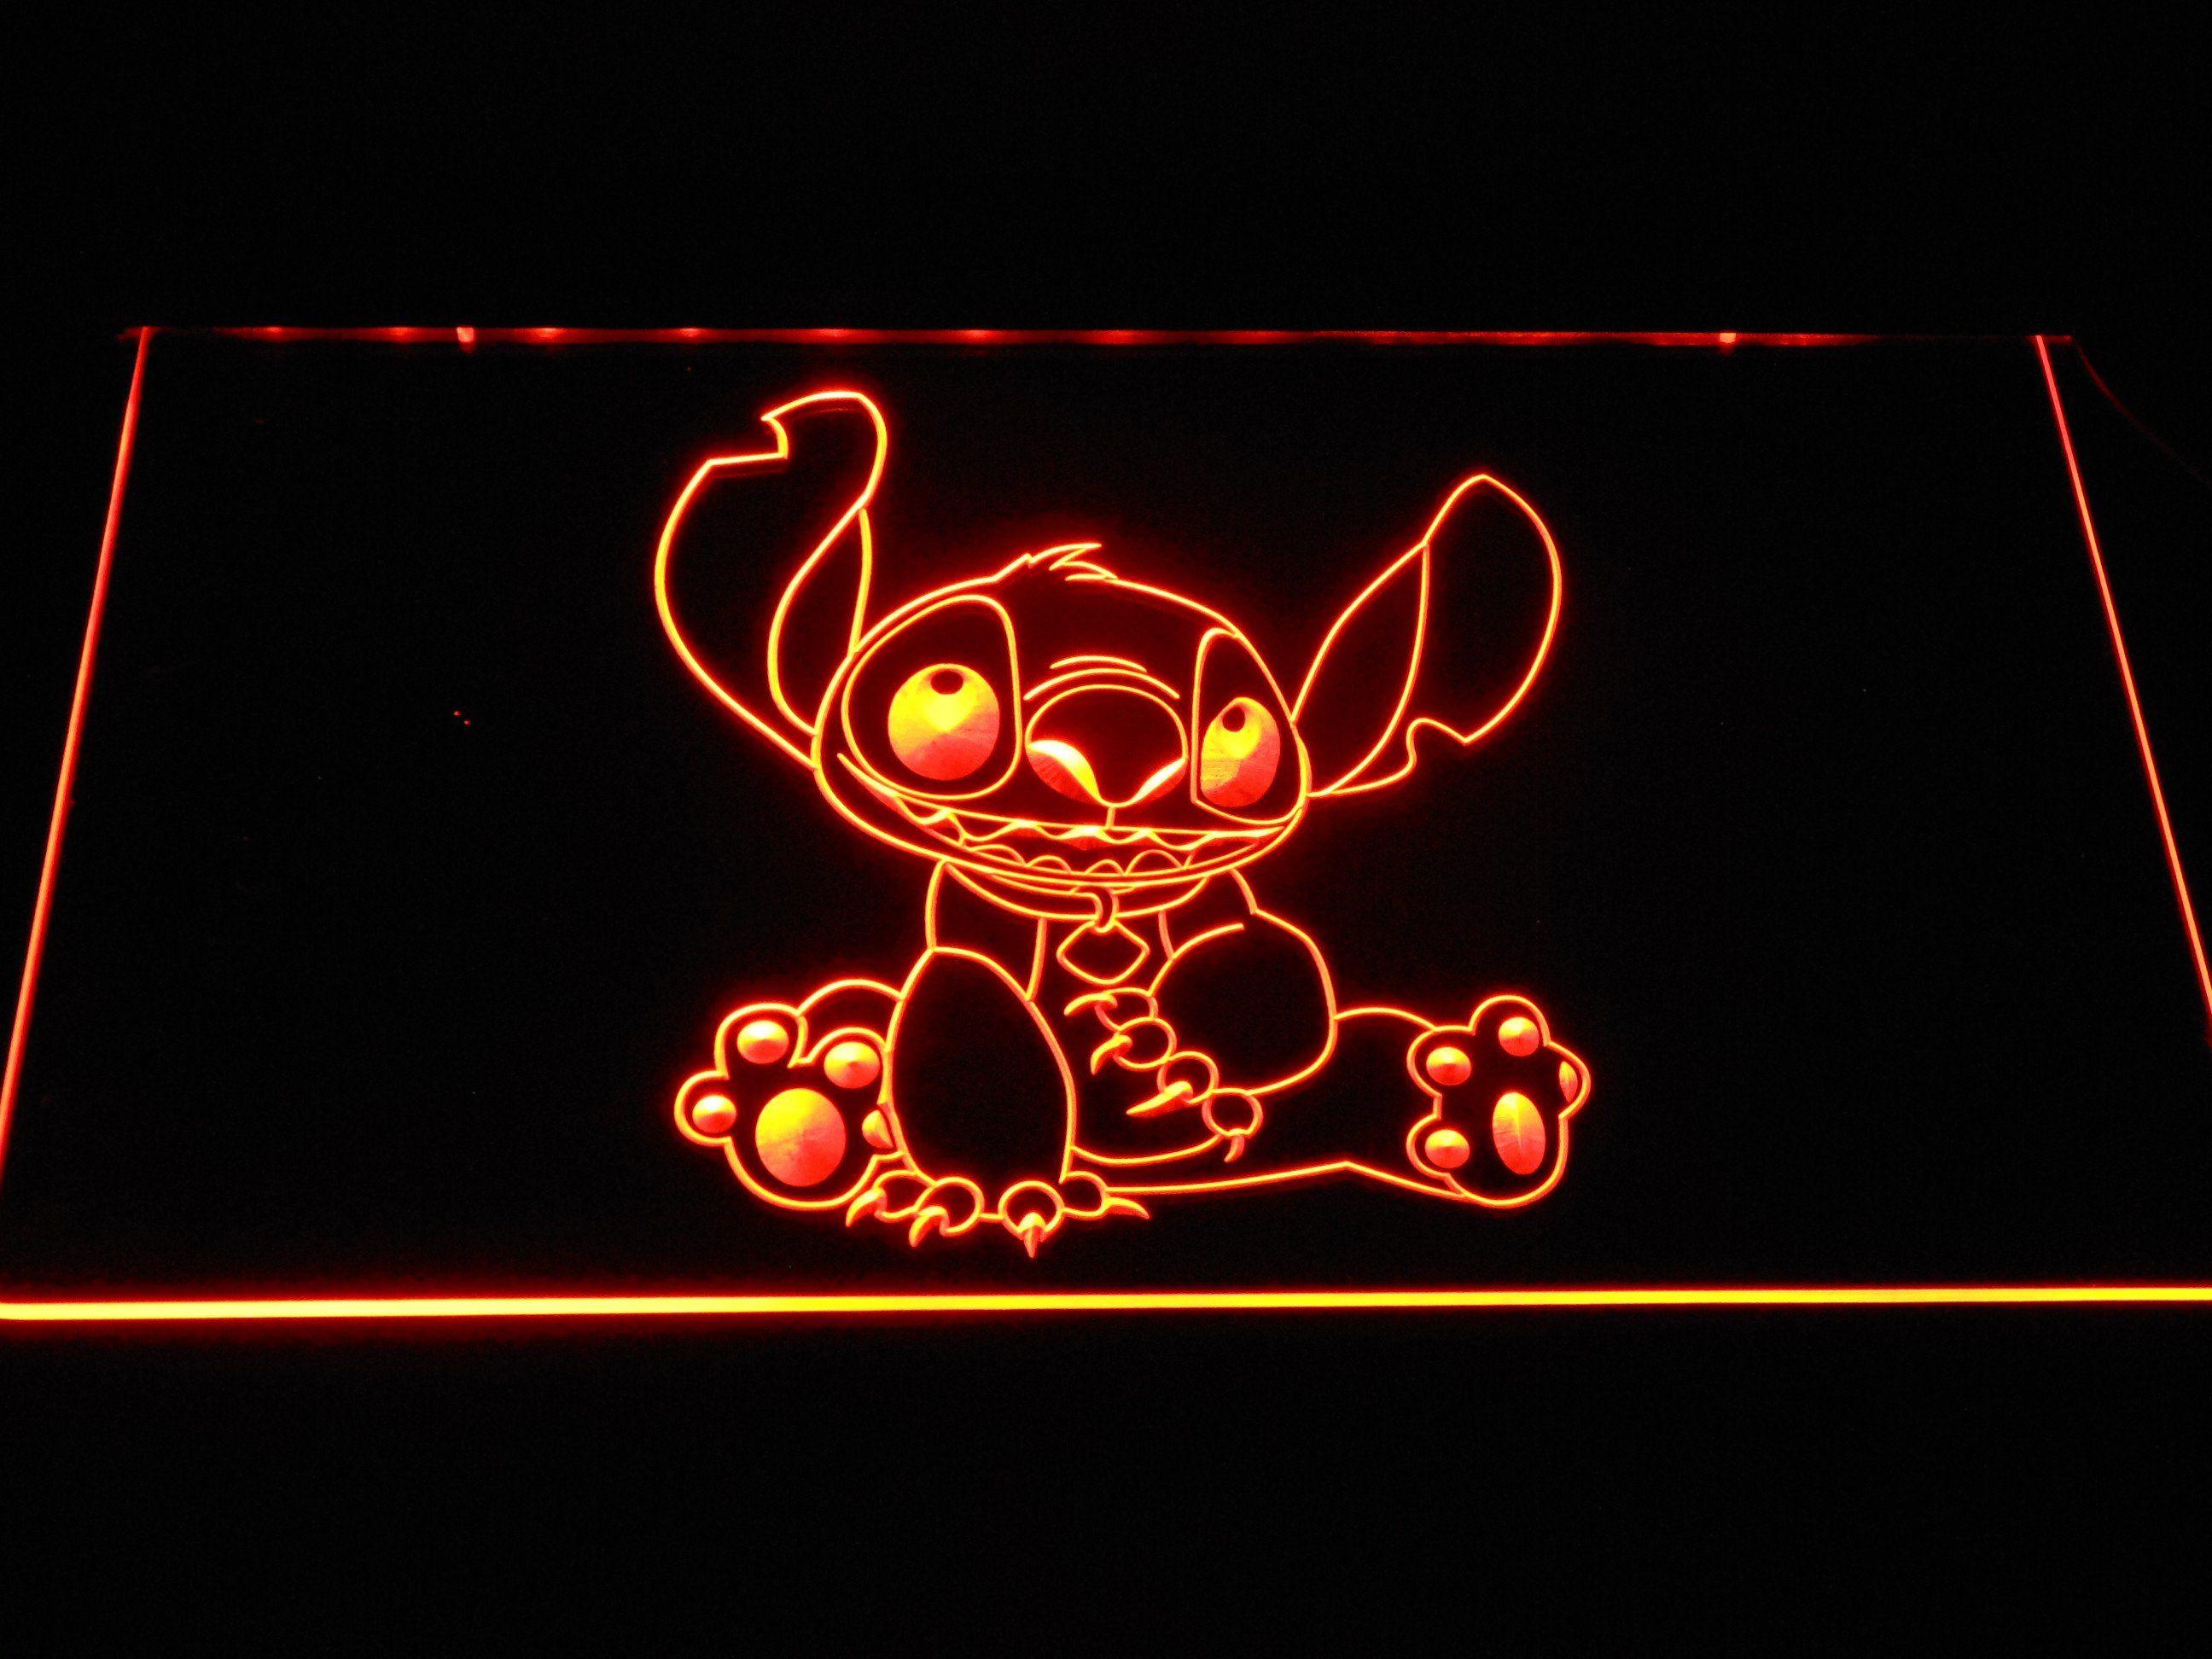 Stitch LED Neon Sign Neon signs, Led neon signs, Cool